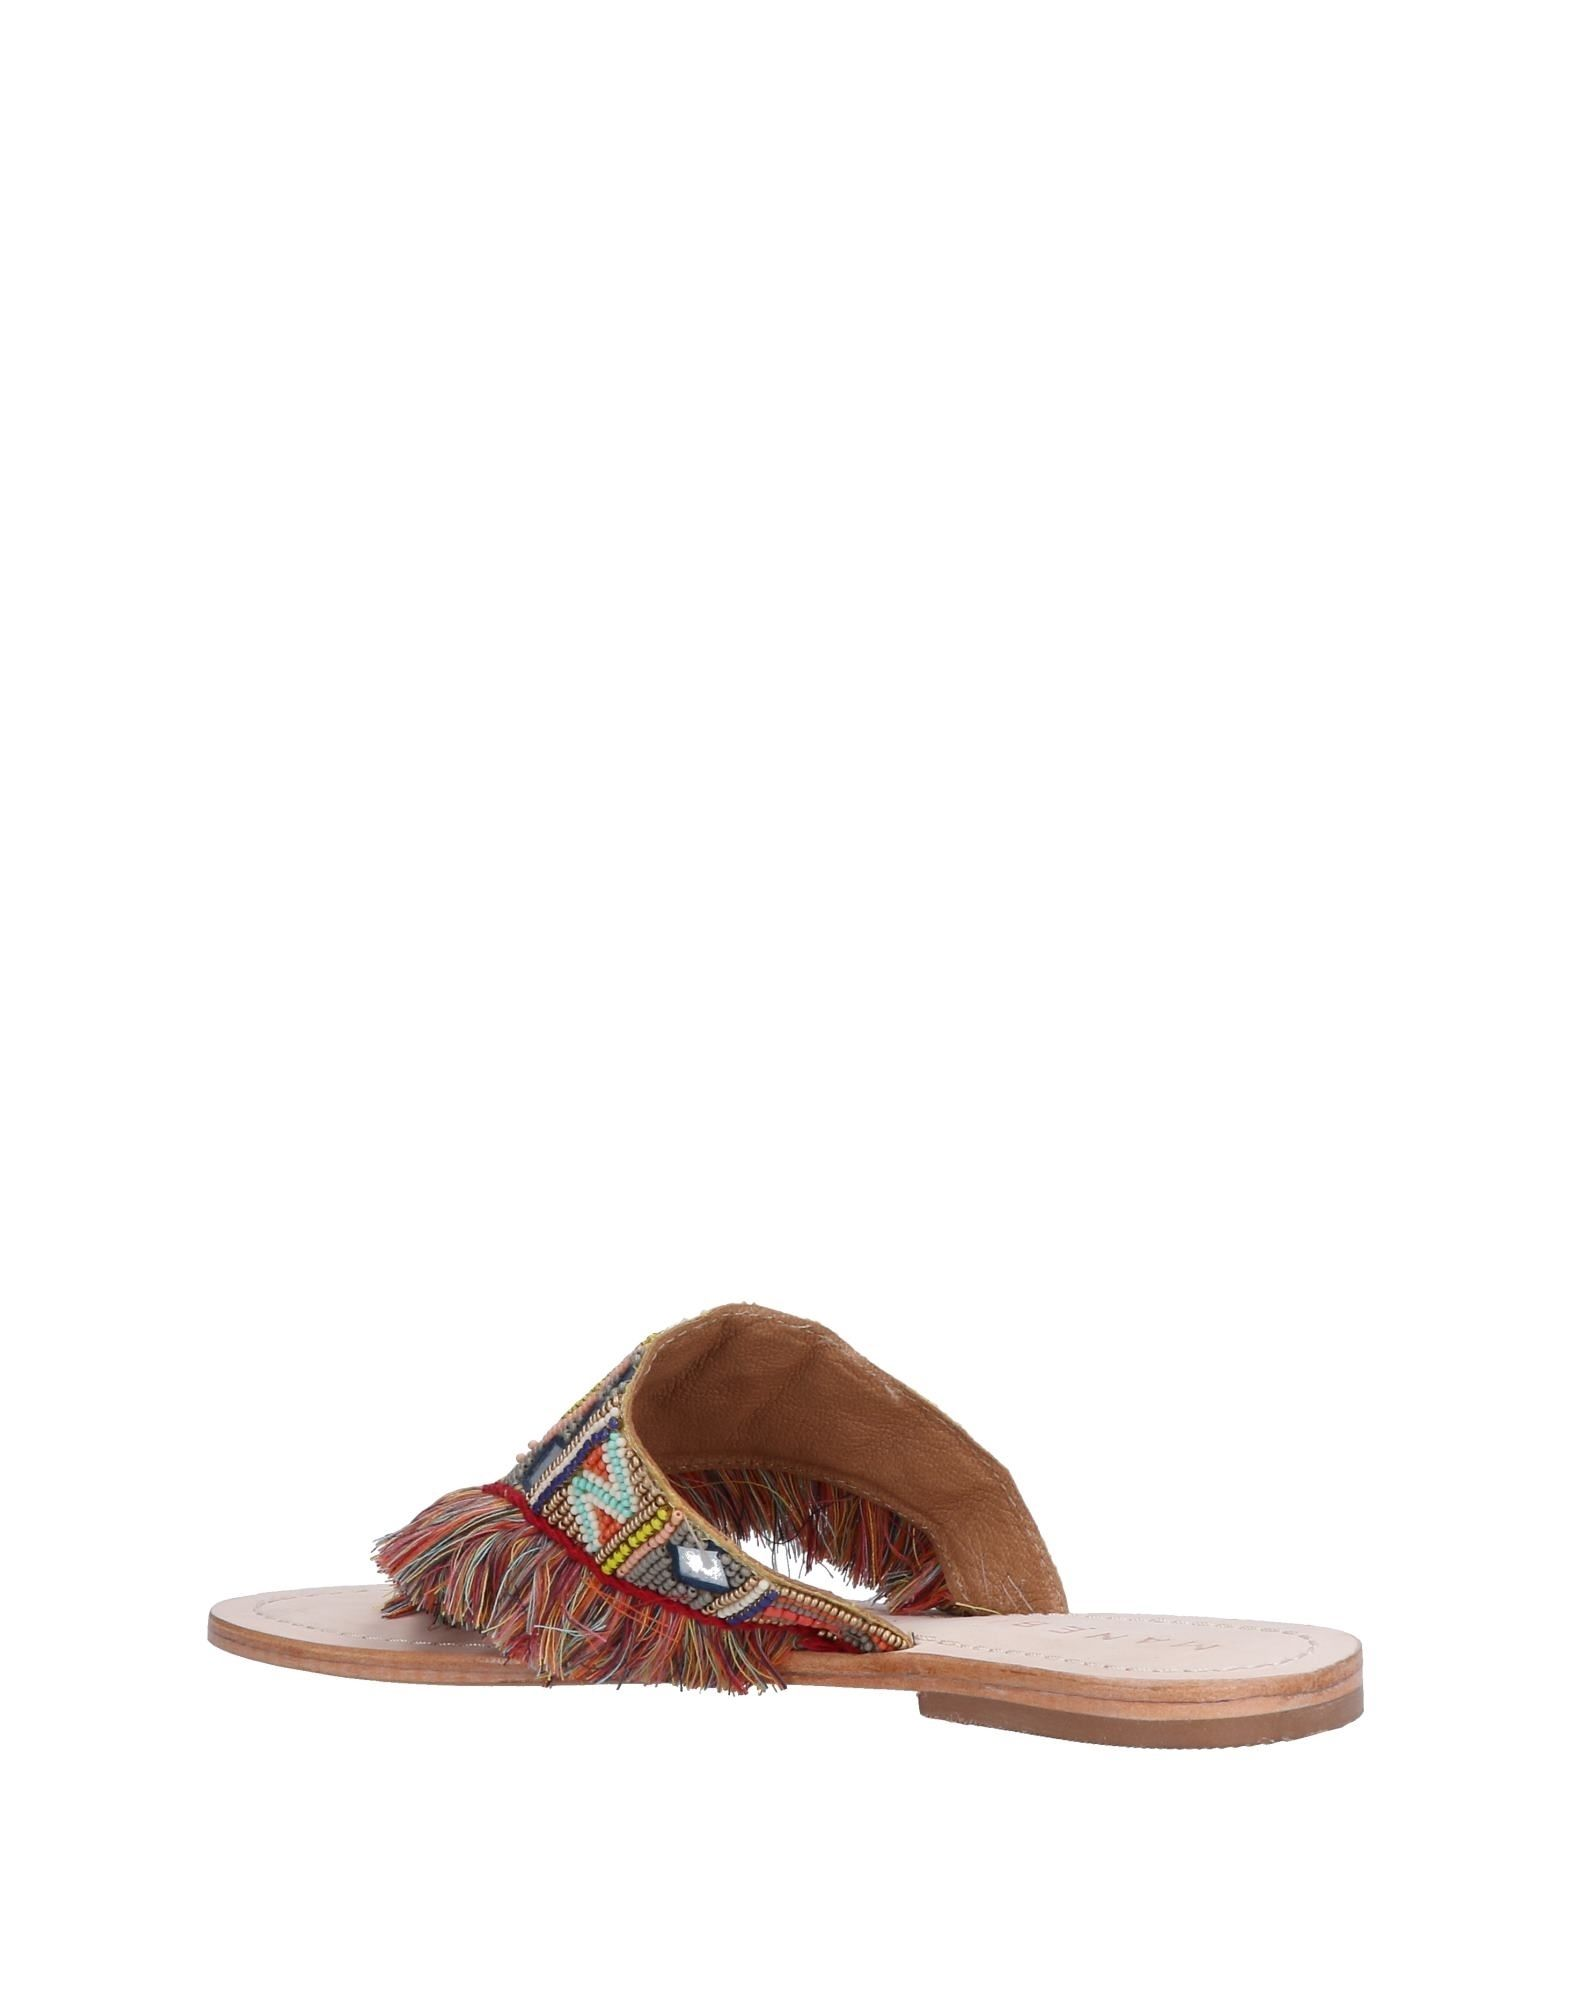 Manebí 11517240PU Dianetten Damen  11517240PU Manebí Gute Qualität beliebte Schuhe c9c4f9